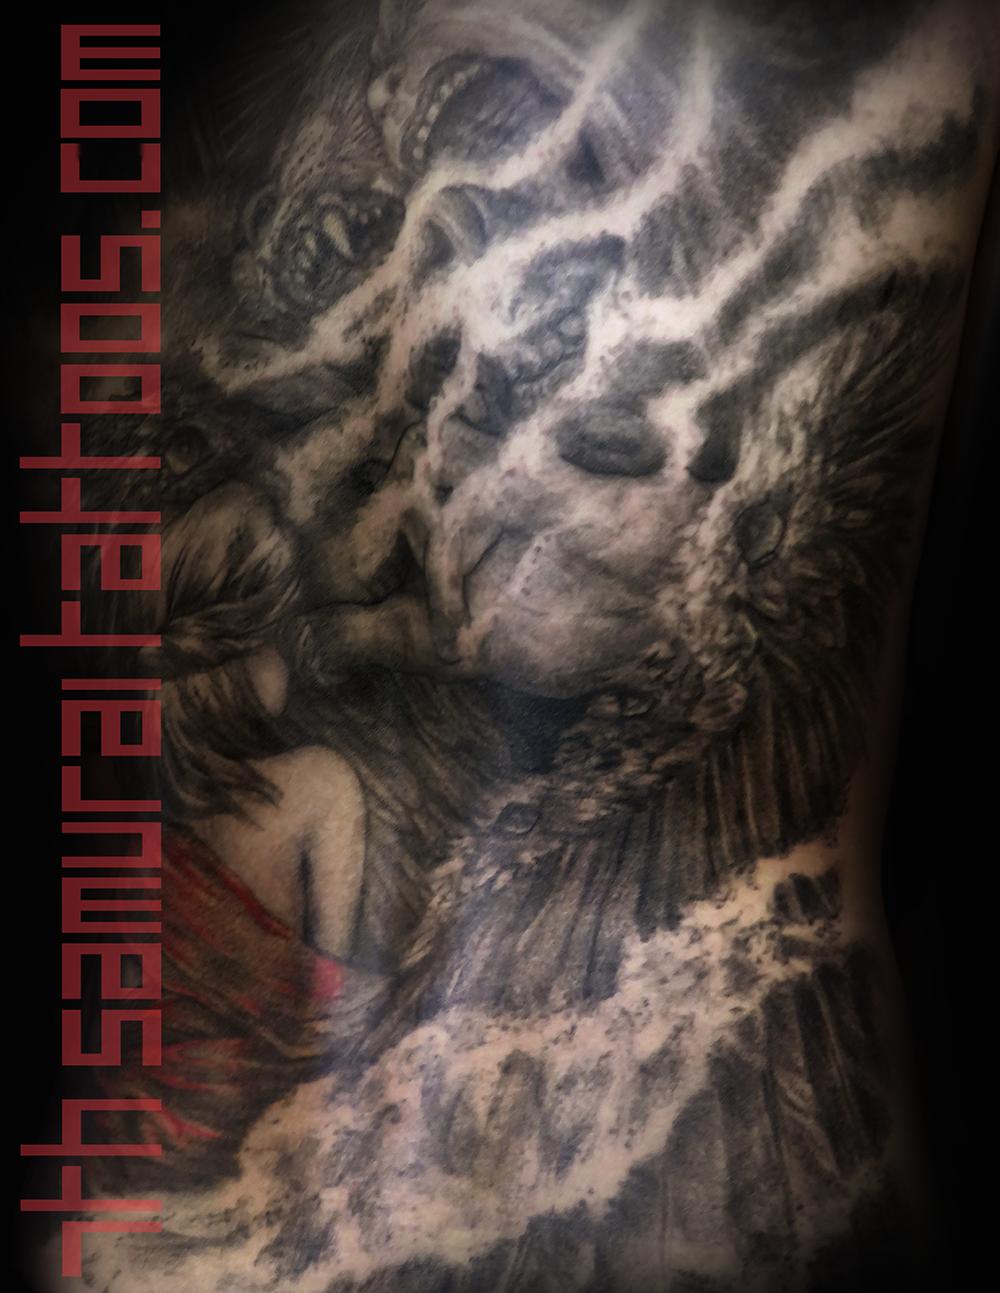 Men's religous Ezekiel 4 headed eagle tiger ox Jesus temptation woman red highlights robes back piece tattoo 4.png